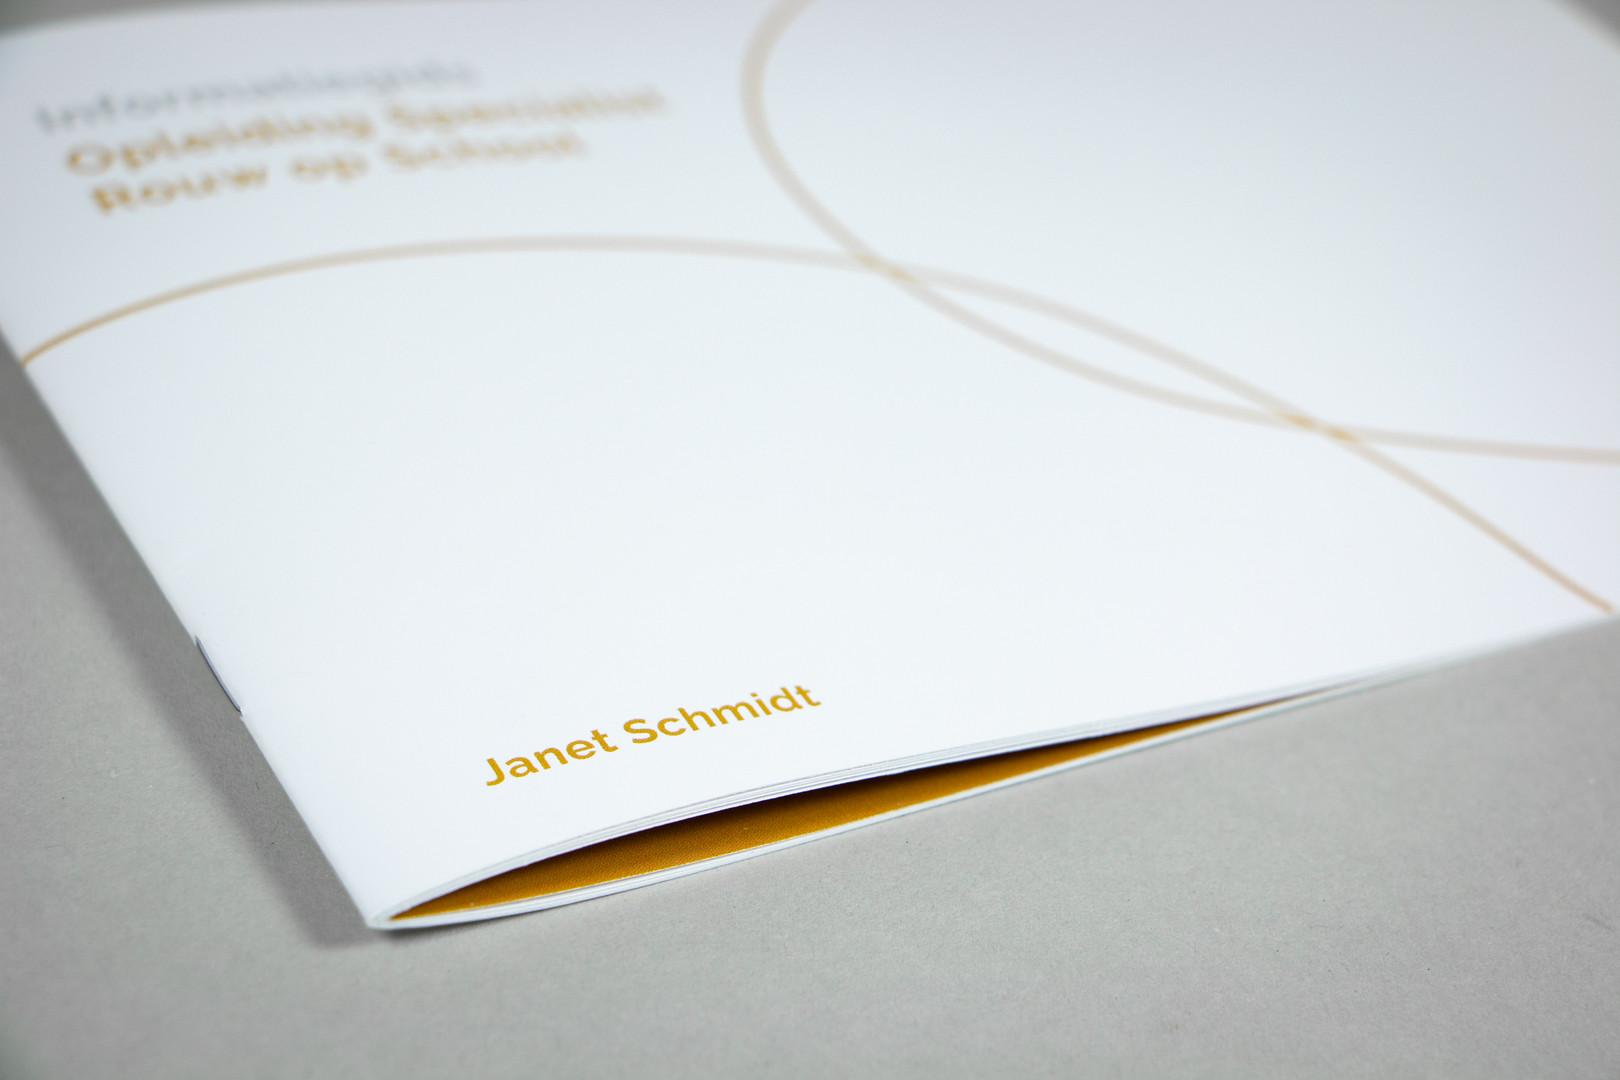 janetschmidt_gids_sanneneuteboom-1-2.jpg